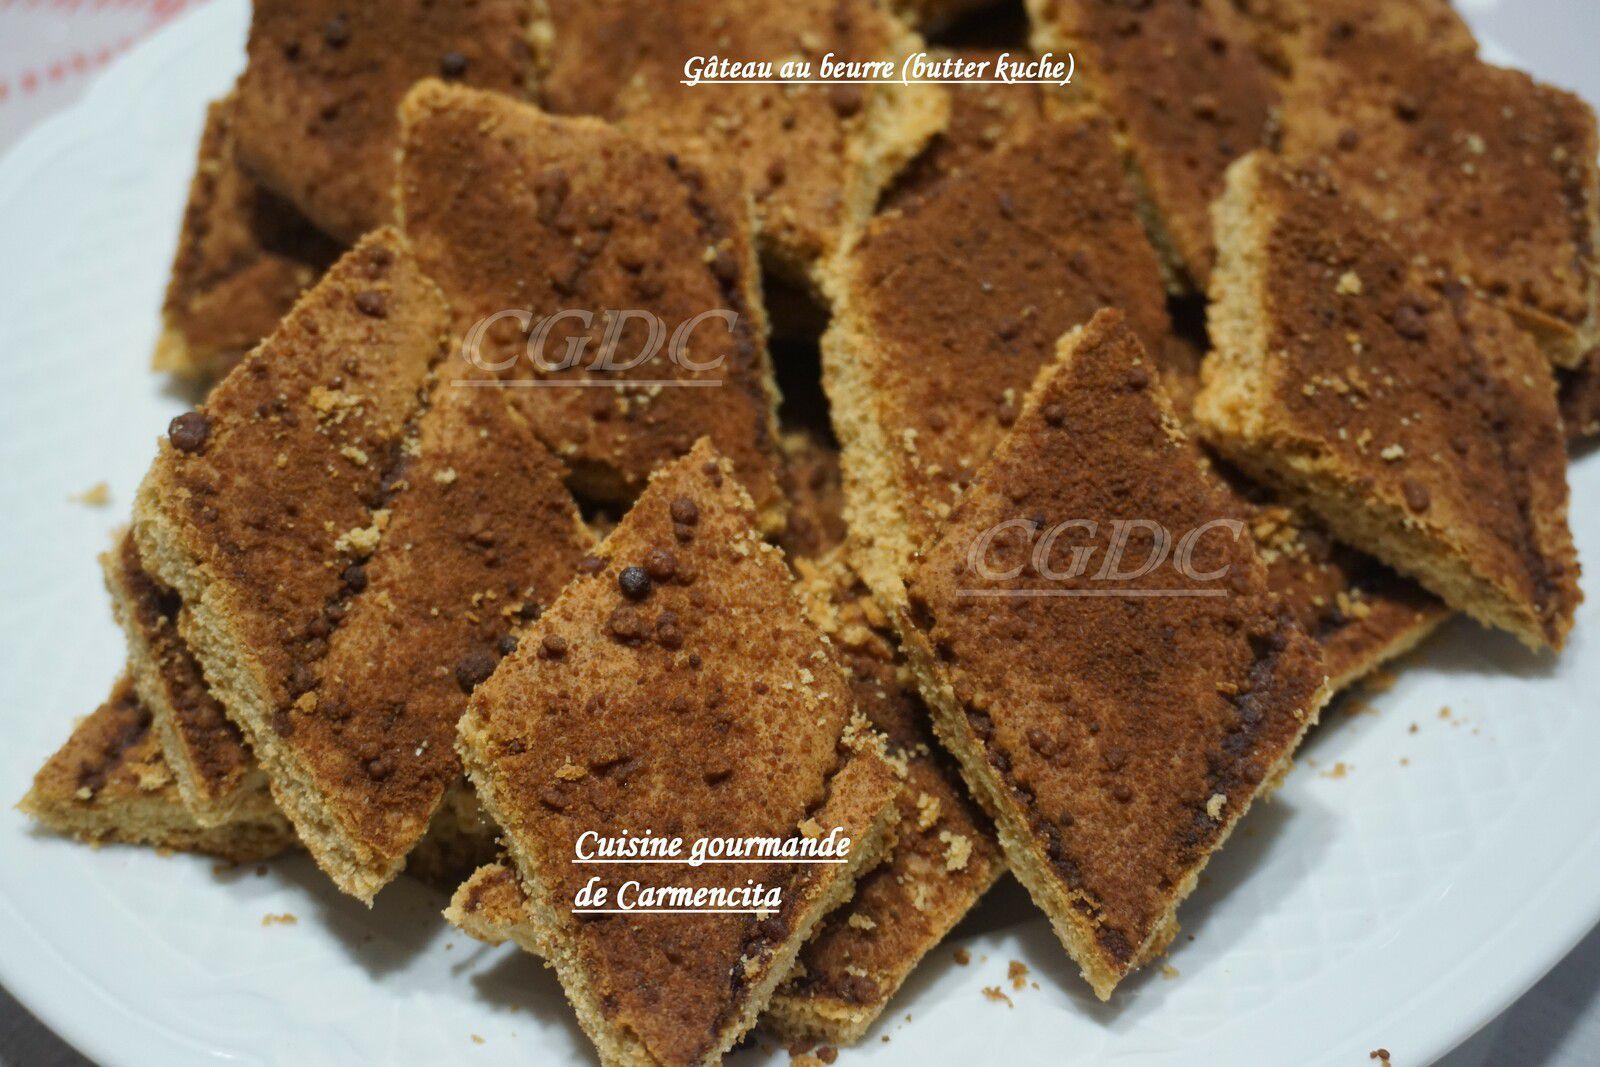 Gâteau au beurre ou butter kuche